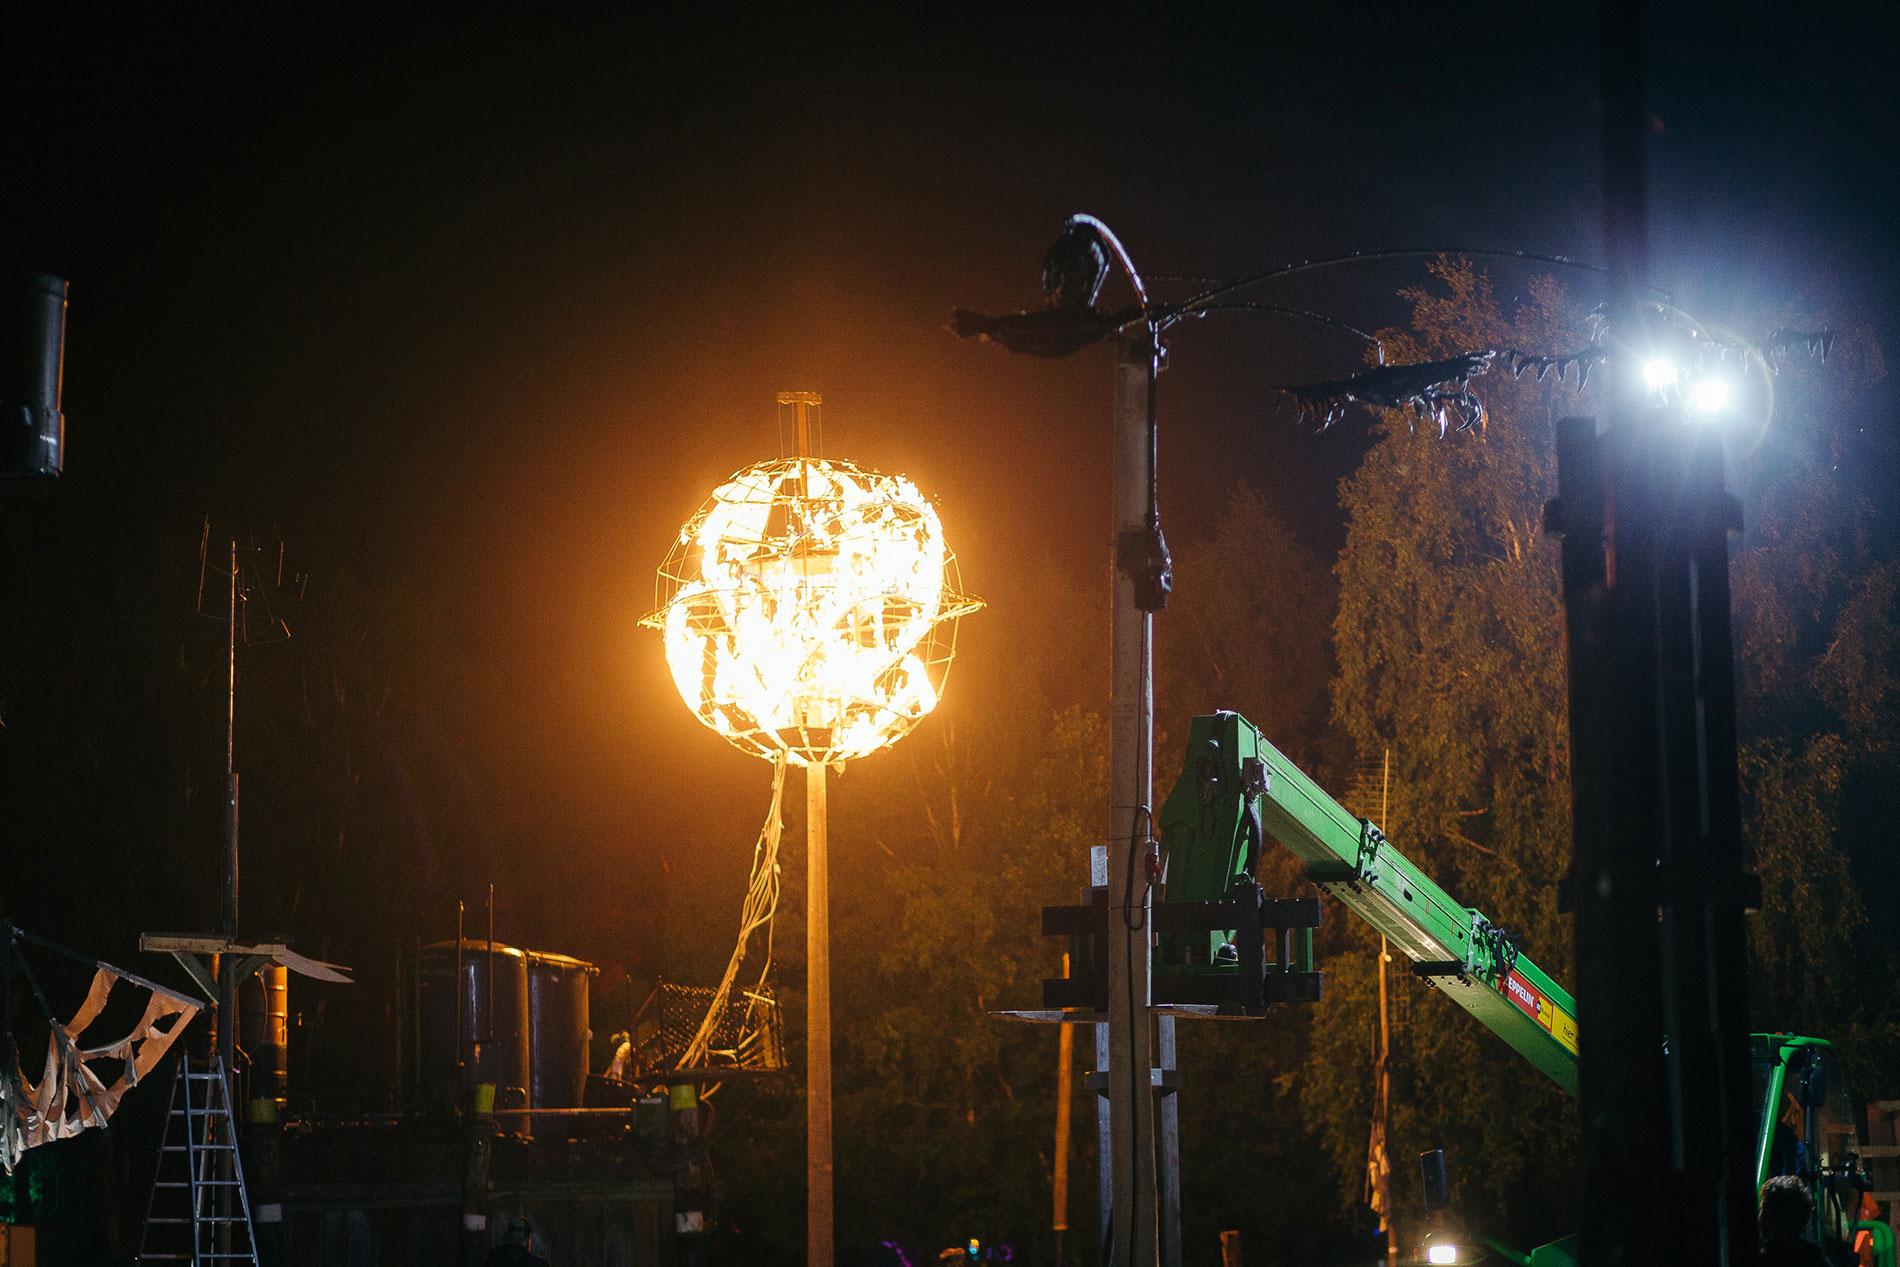 Feuerinstallation auf dem Fusion Festival